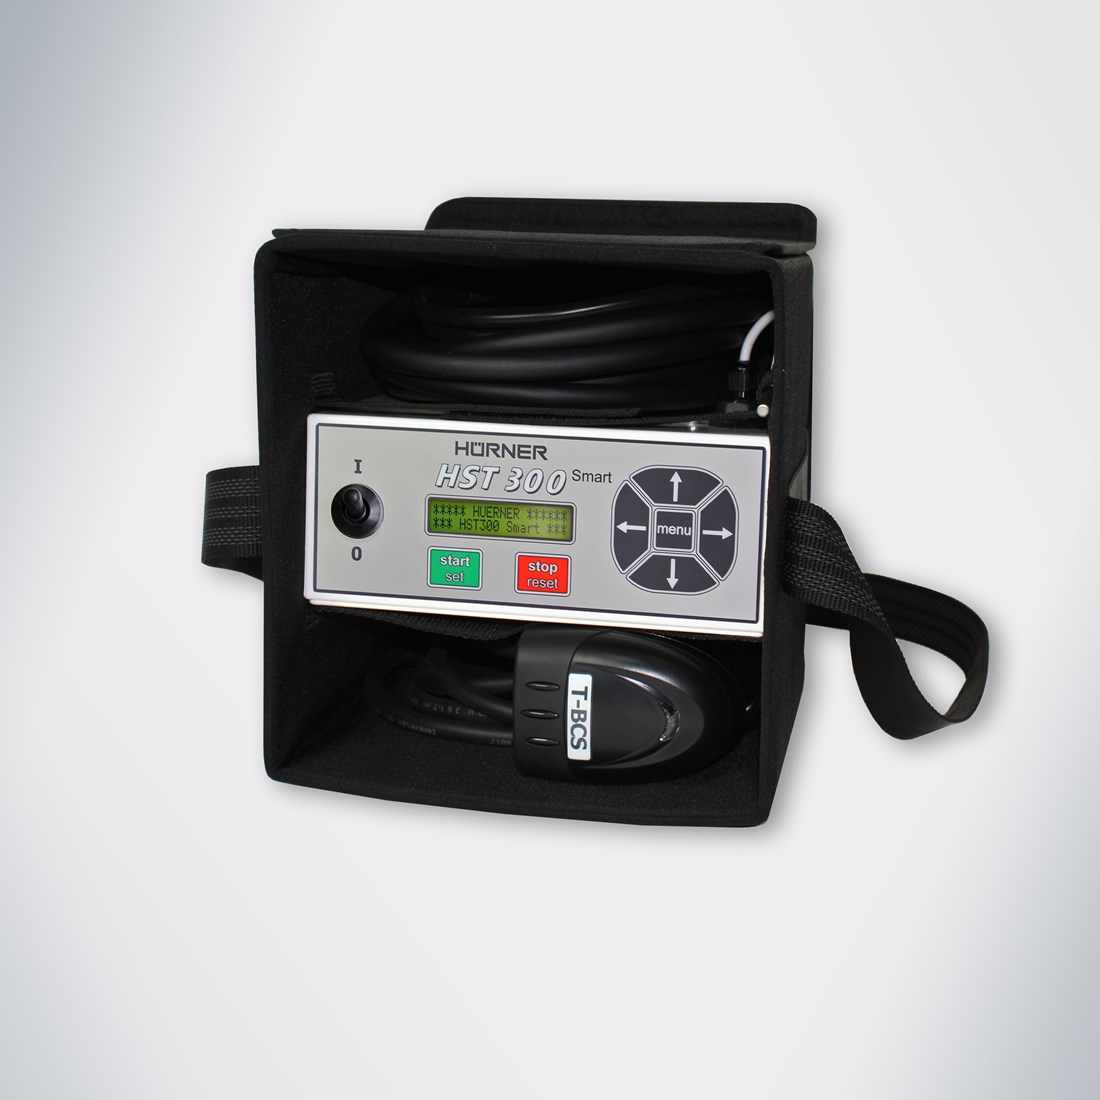 Hurner Elektrolasmachine HST300 smart Max d160 301-000-000